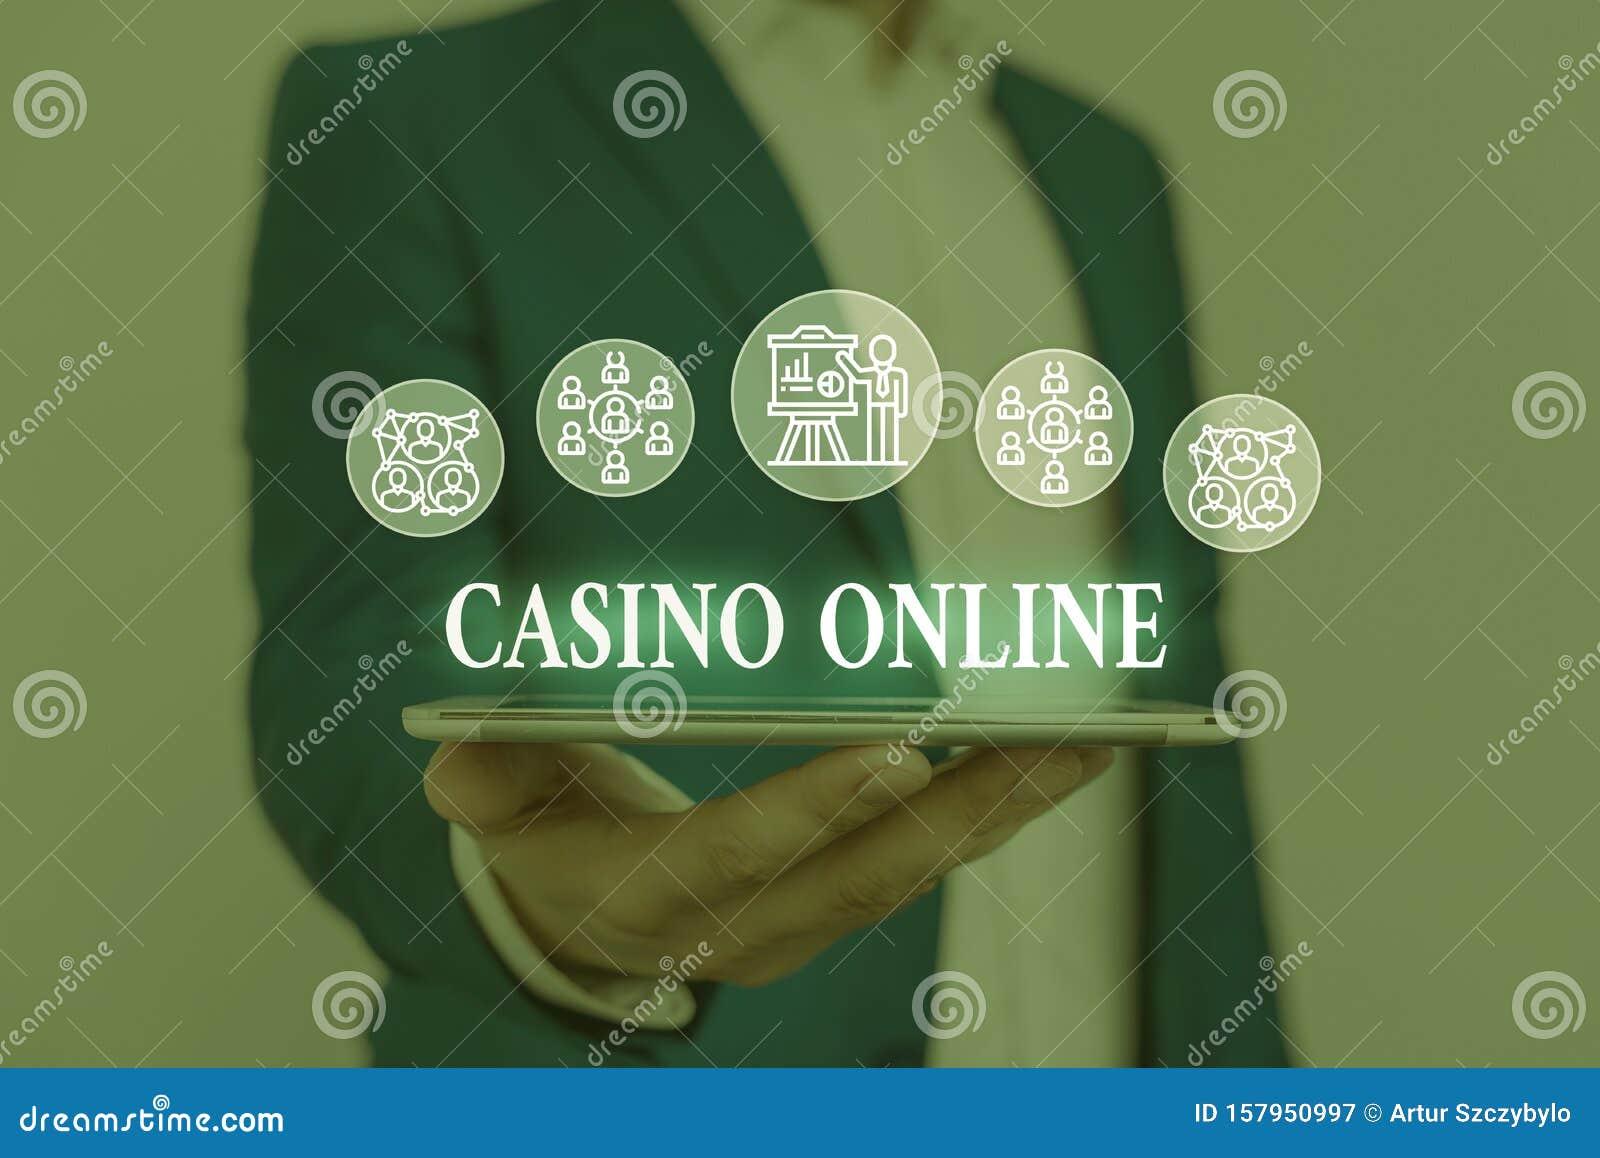 Bet on something high stakes no money selita ebanks on bet